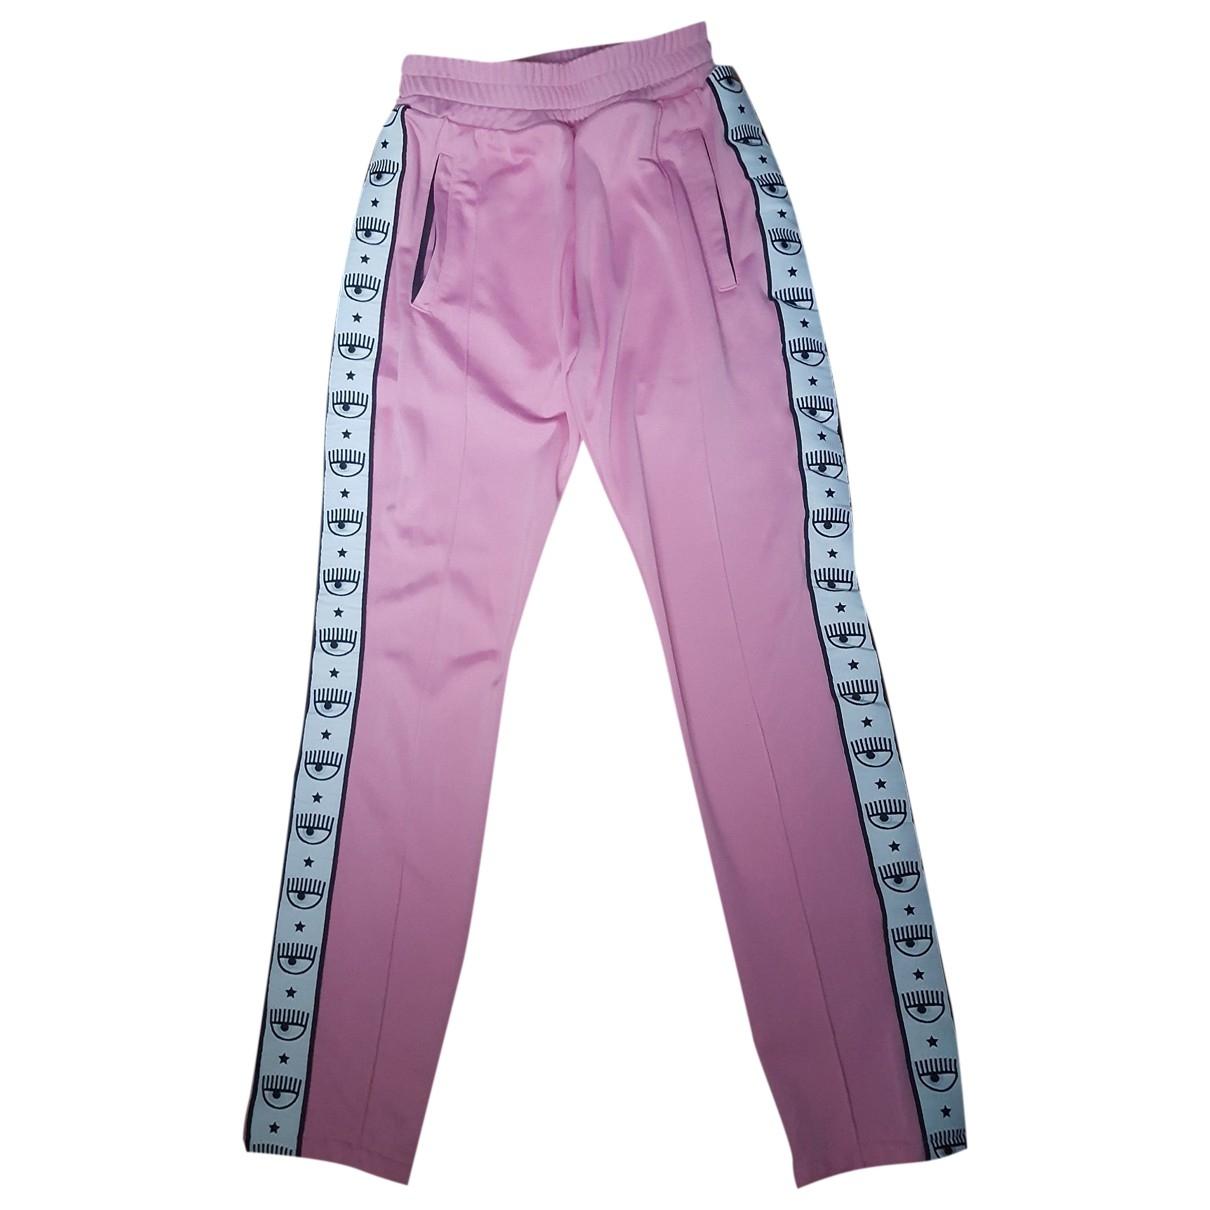 Chiara Ferragni \N Pink Trousers for Women M International